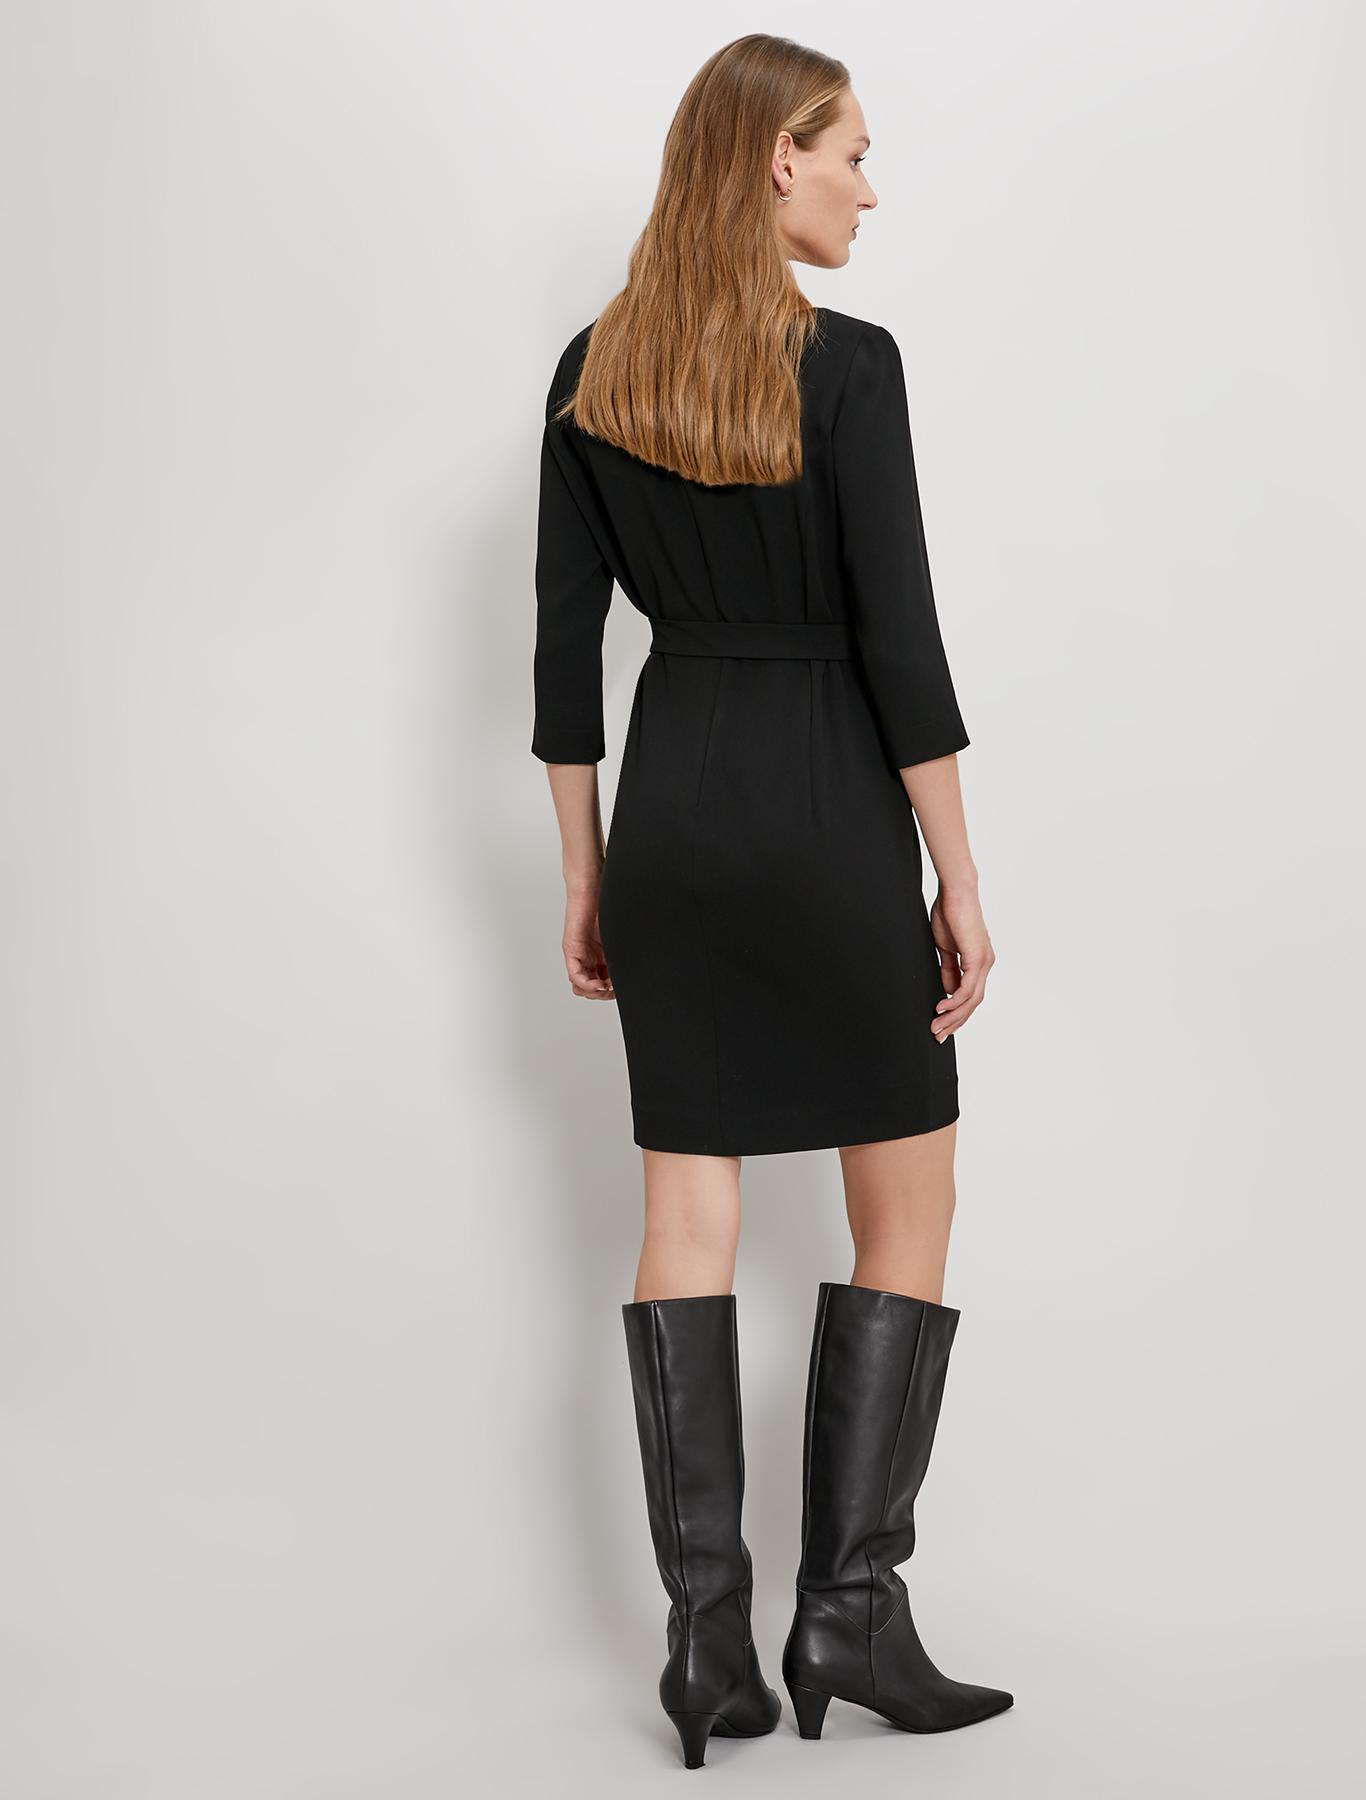 Pencil dress in fluid fabric - black - pennyblack